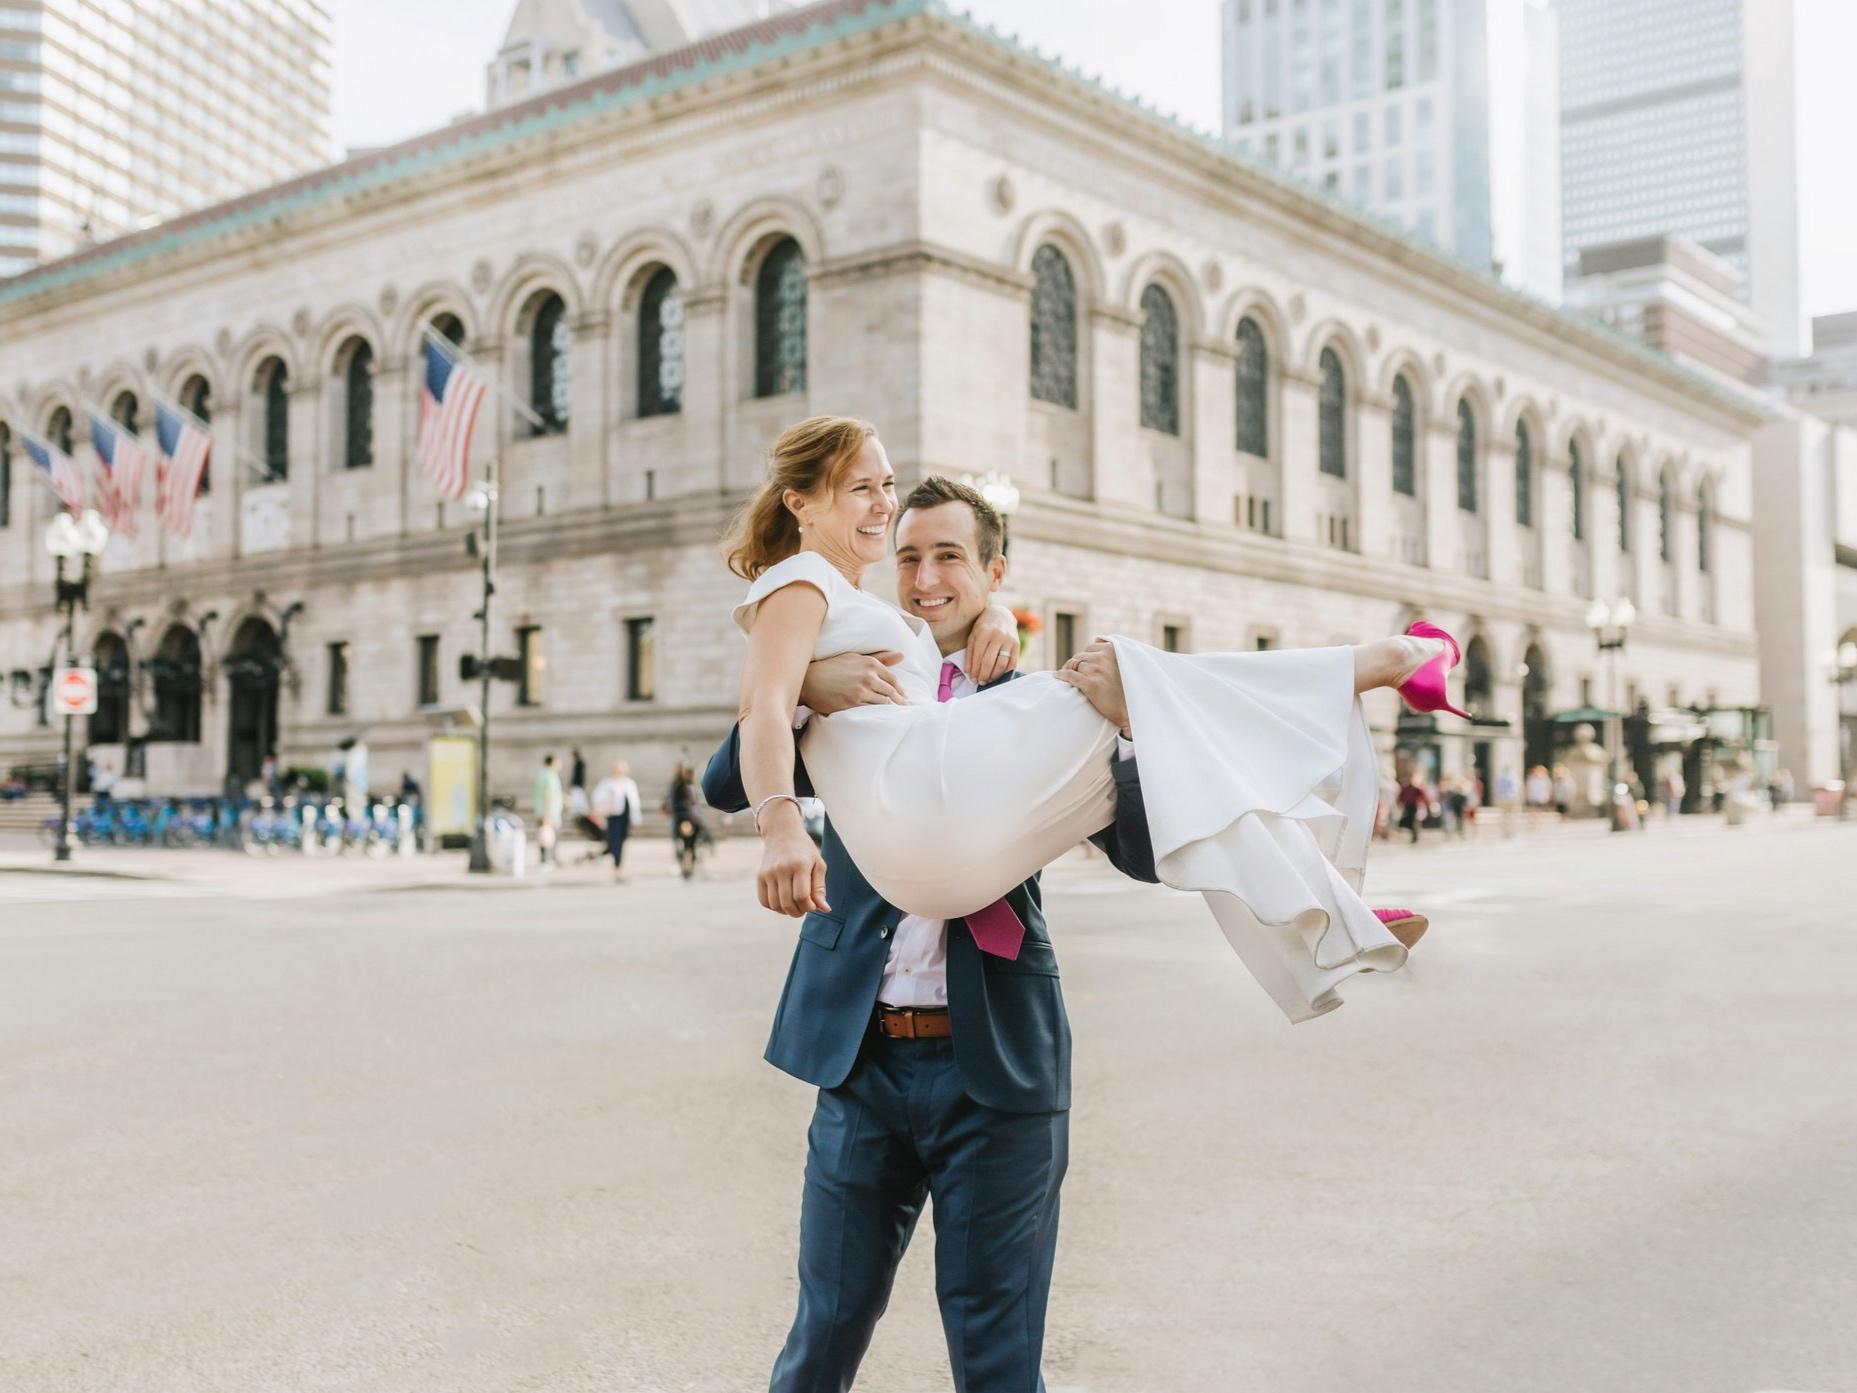 Boston-City-Hall-Back-Bay-Wedding-023.JPG